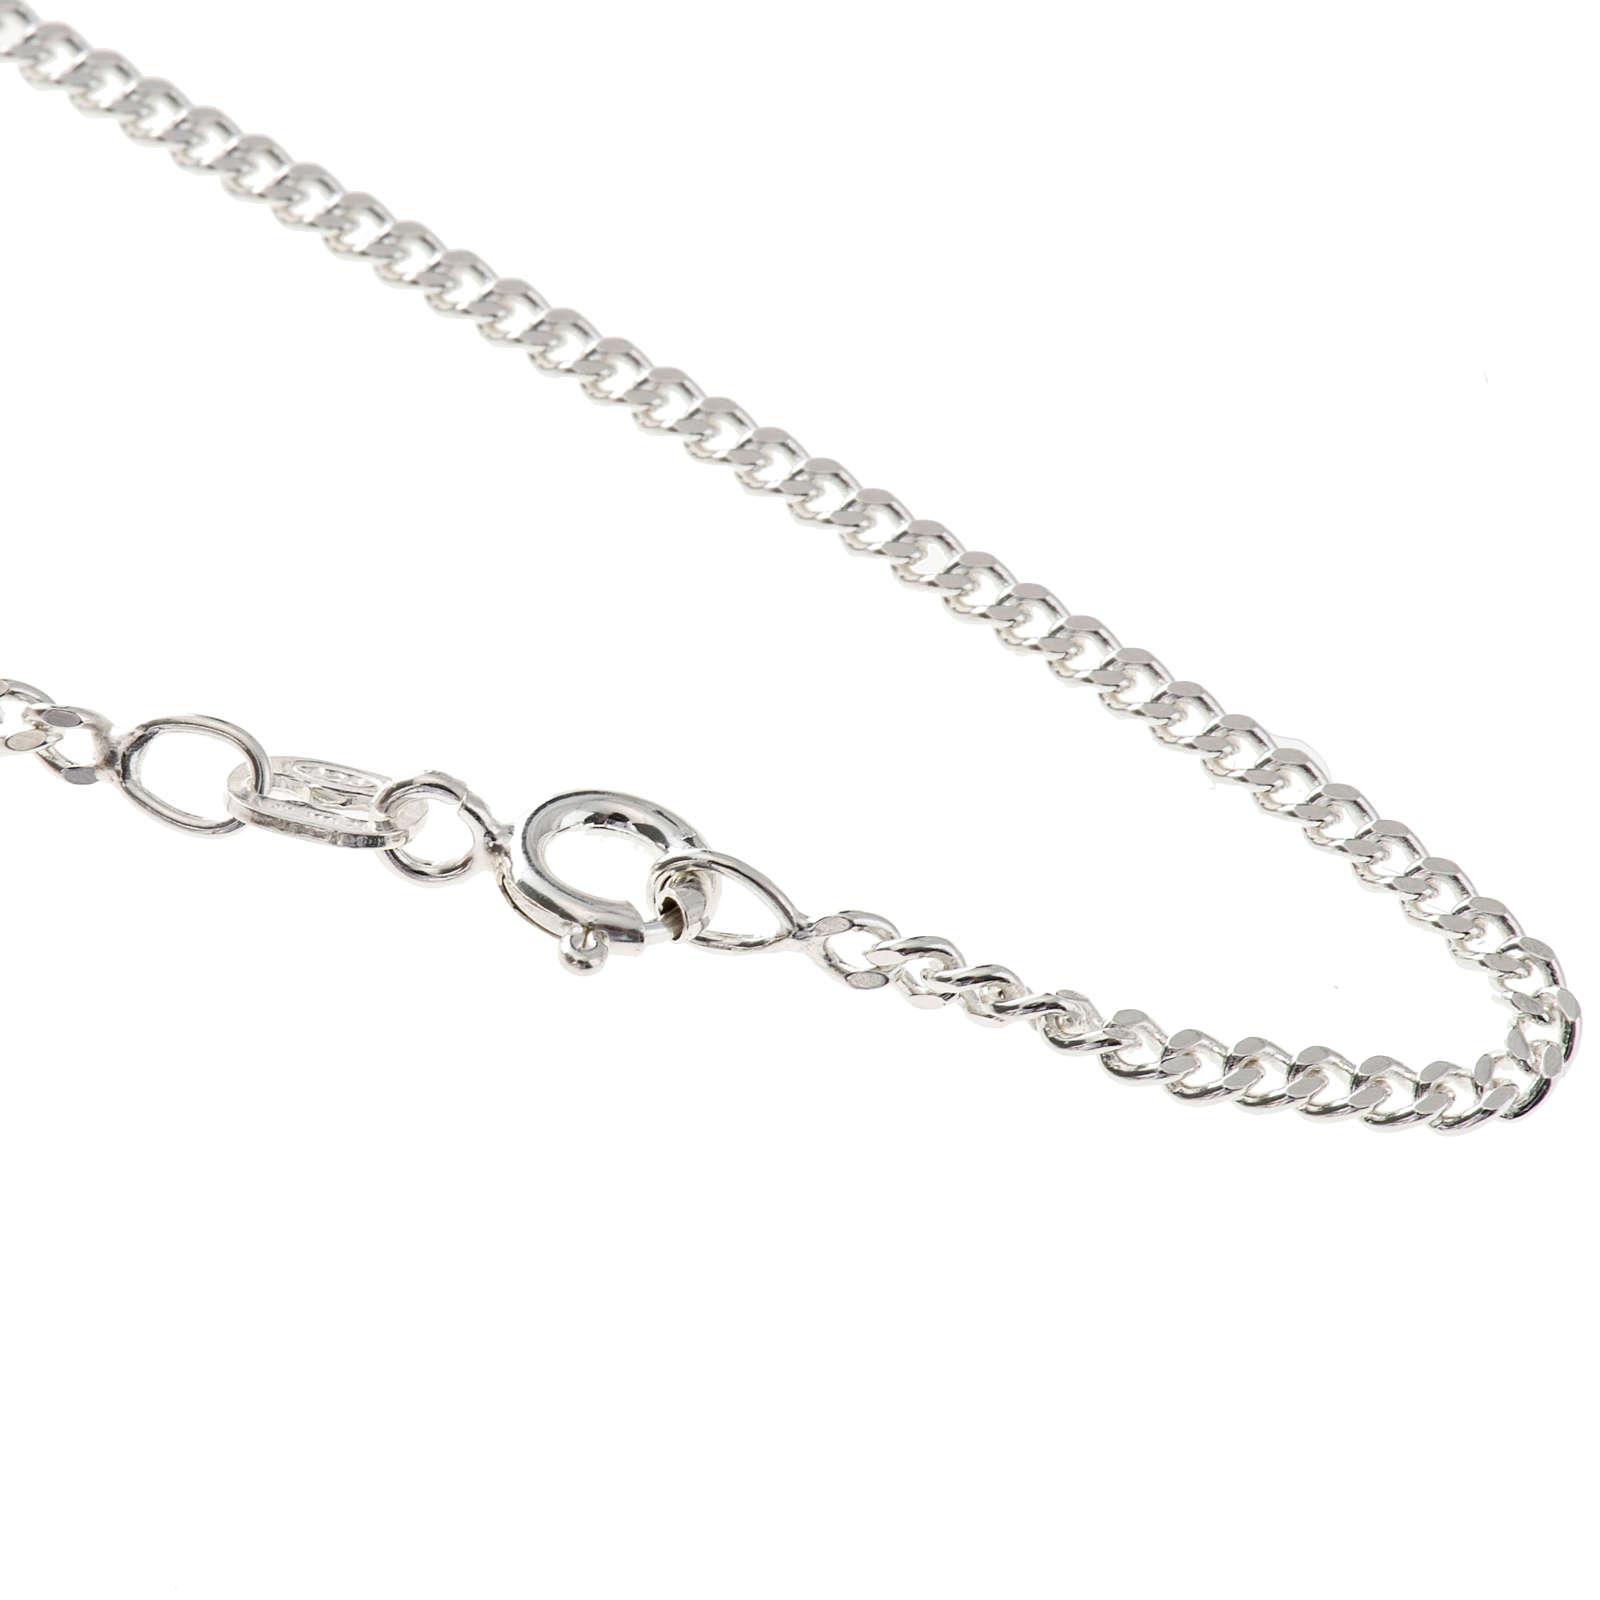 Catena grumetta argento 925 lunghezza 50 cm 4